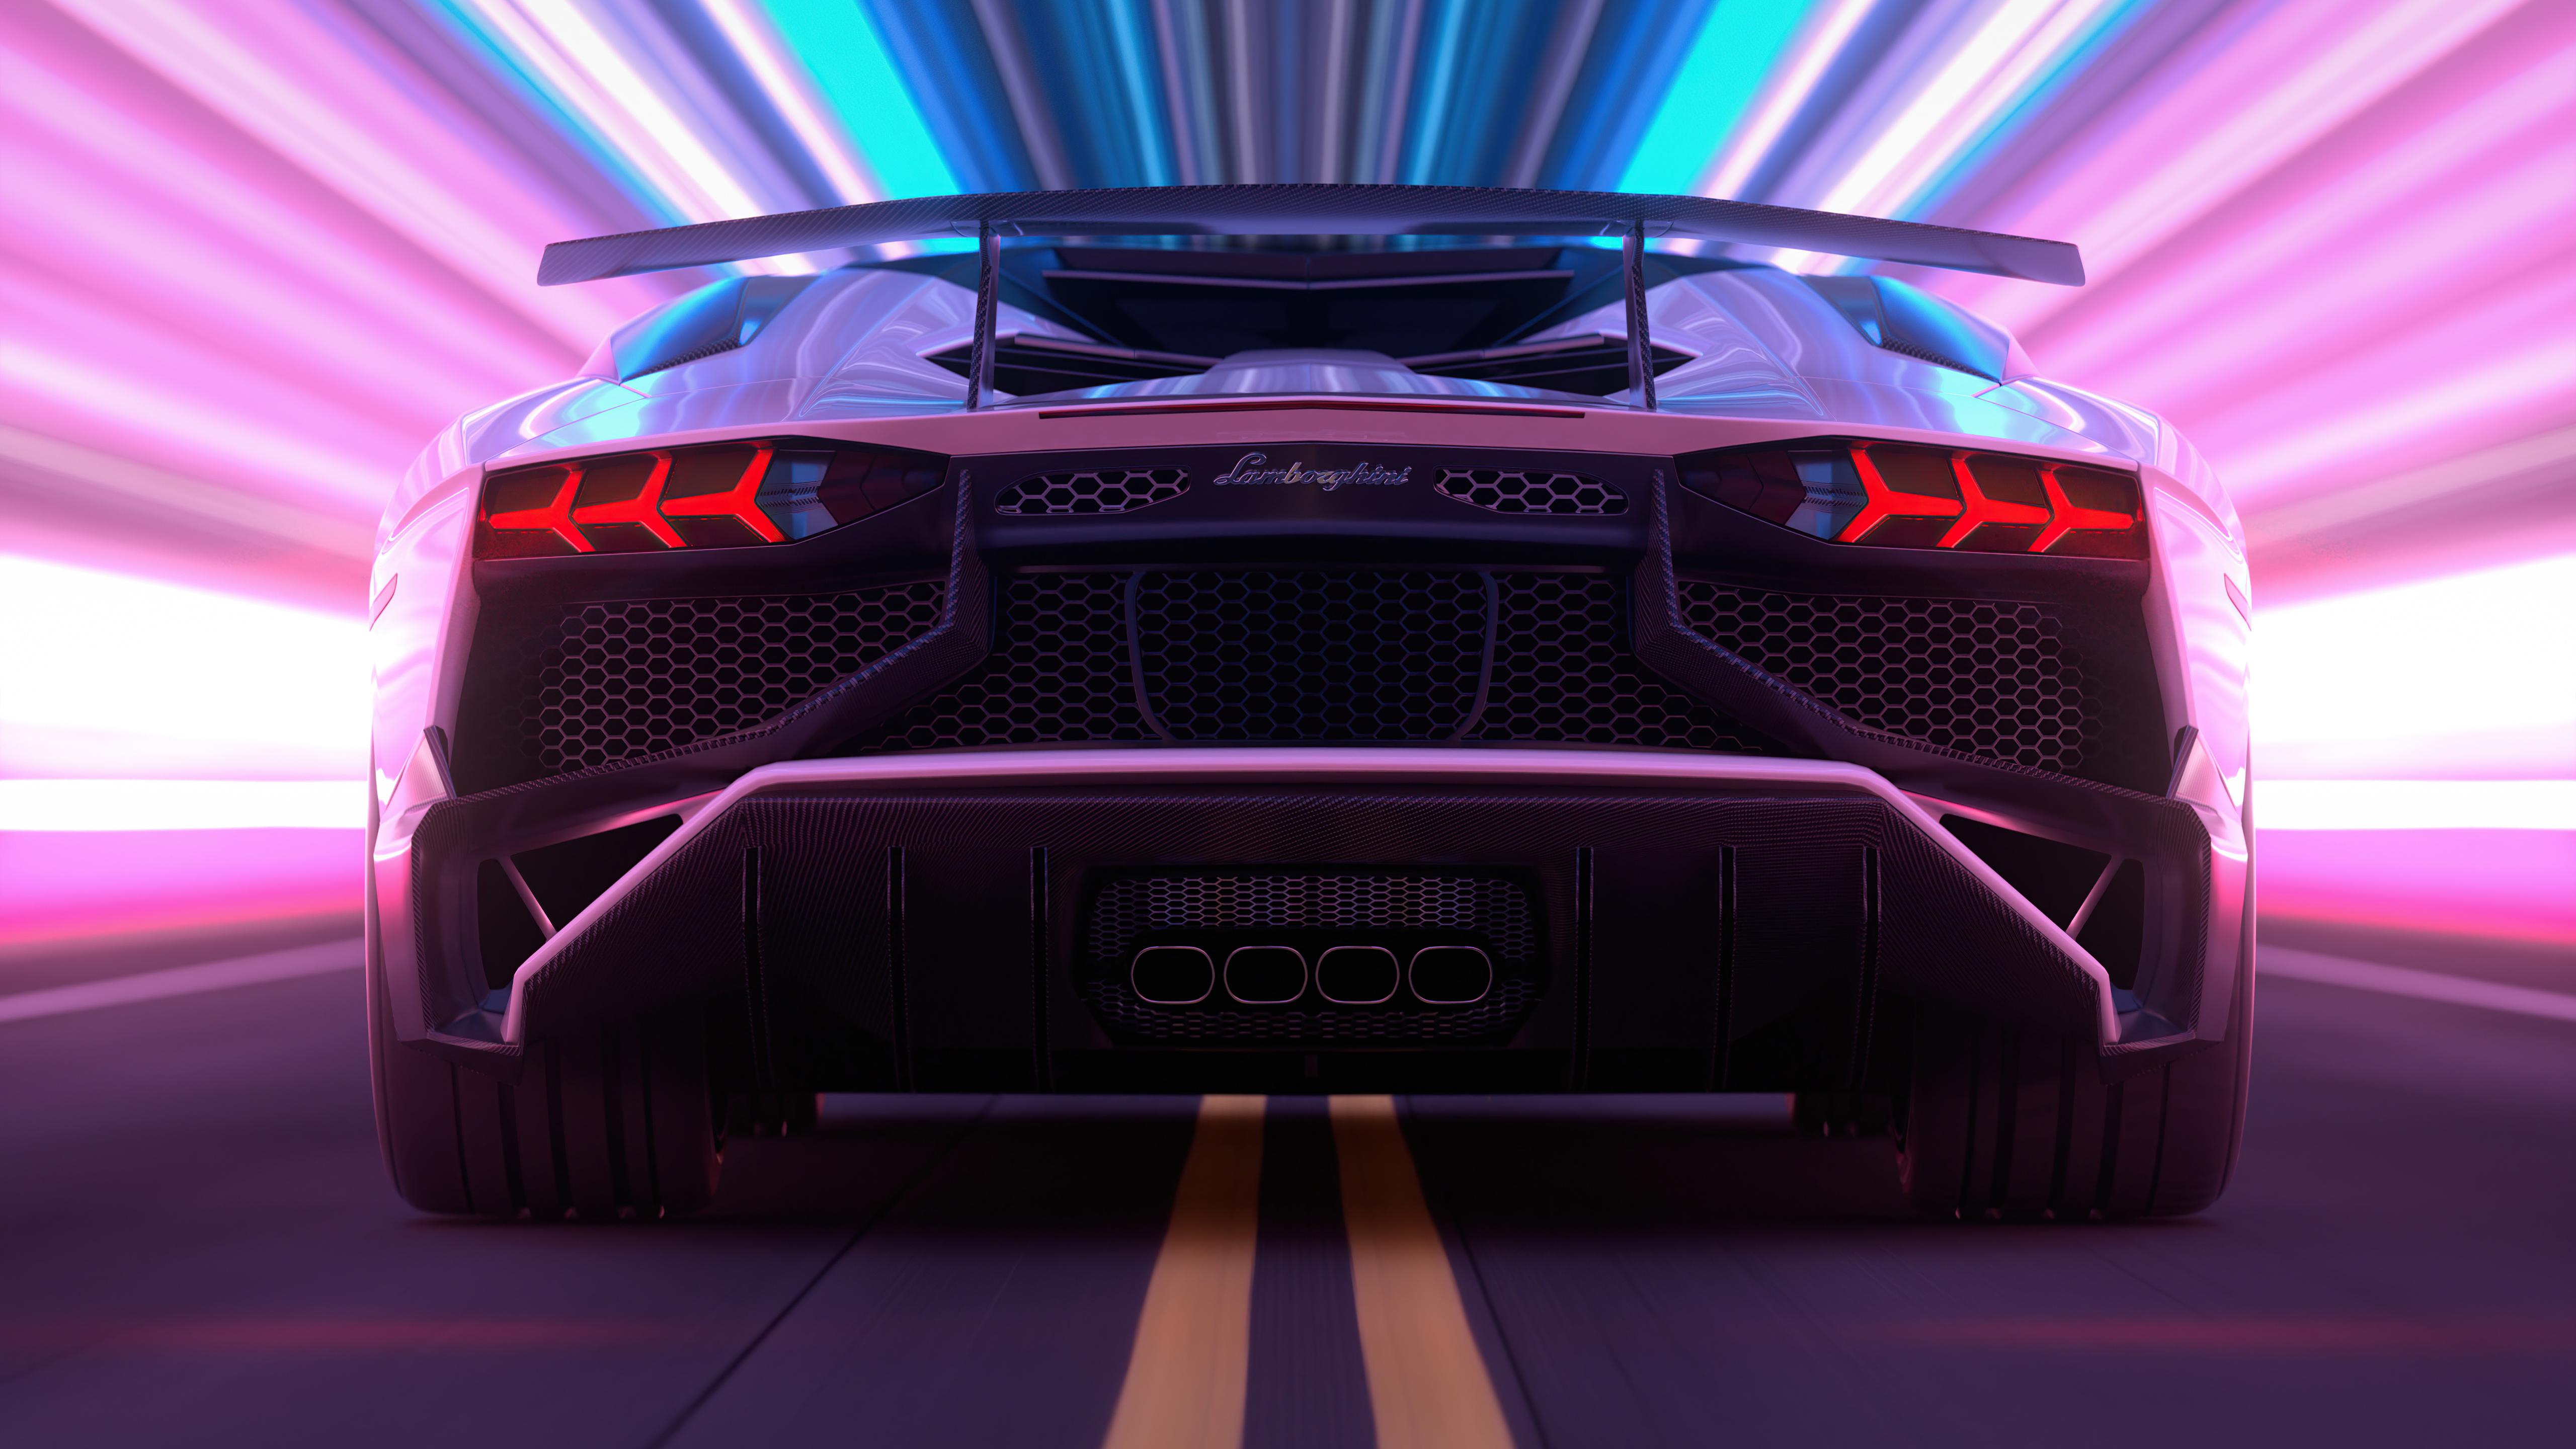 lamborghini aventador retro 4k 1620167218 - Lamborghini Aventador Retro 4k - Lamborghini Aventador Retro 4k wallpapers